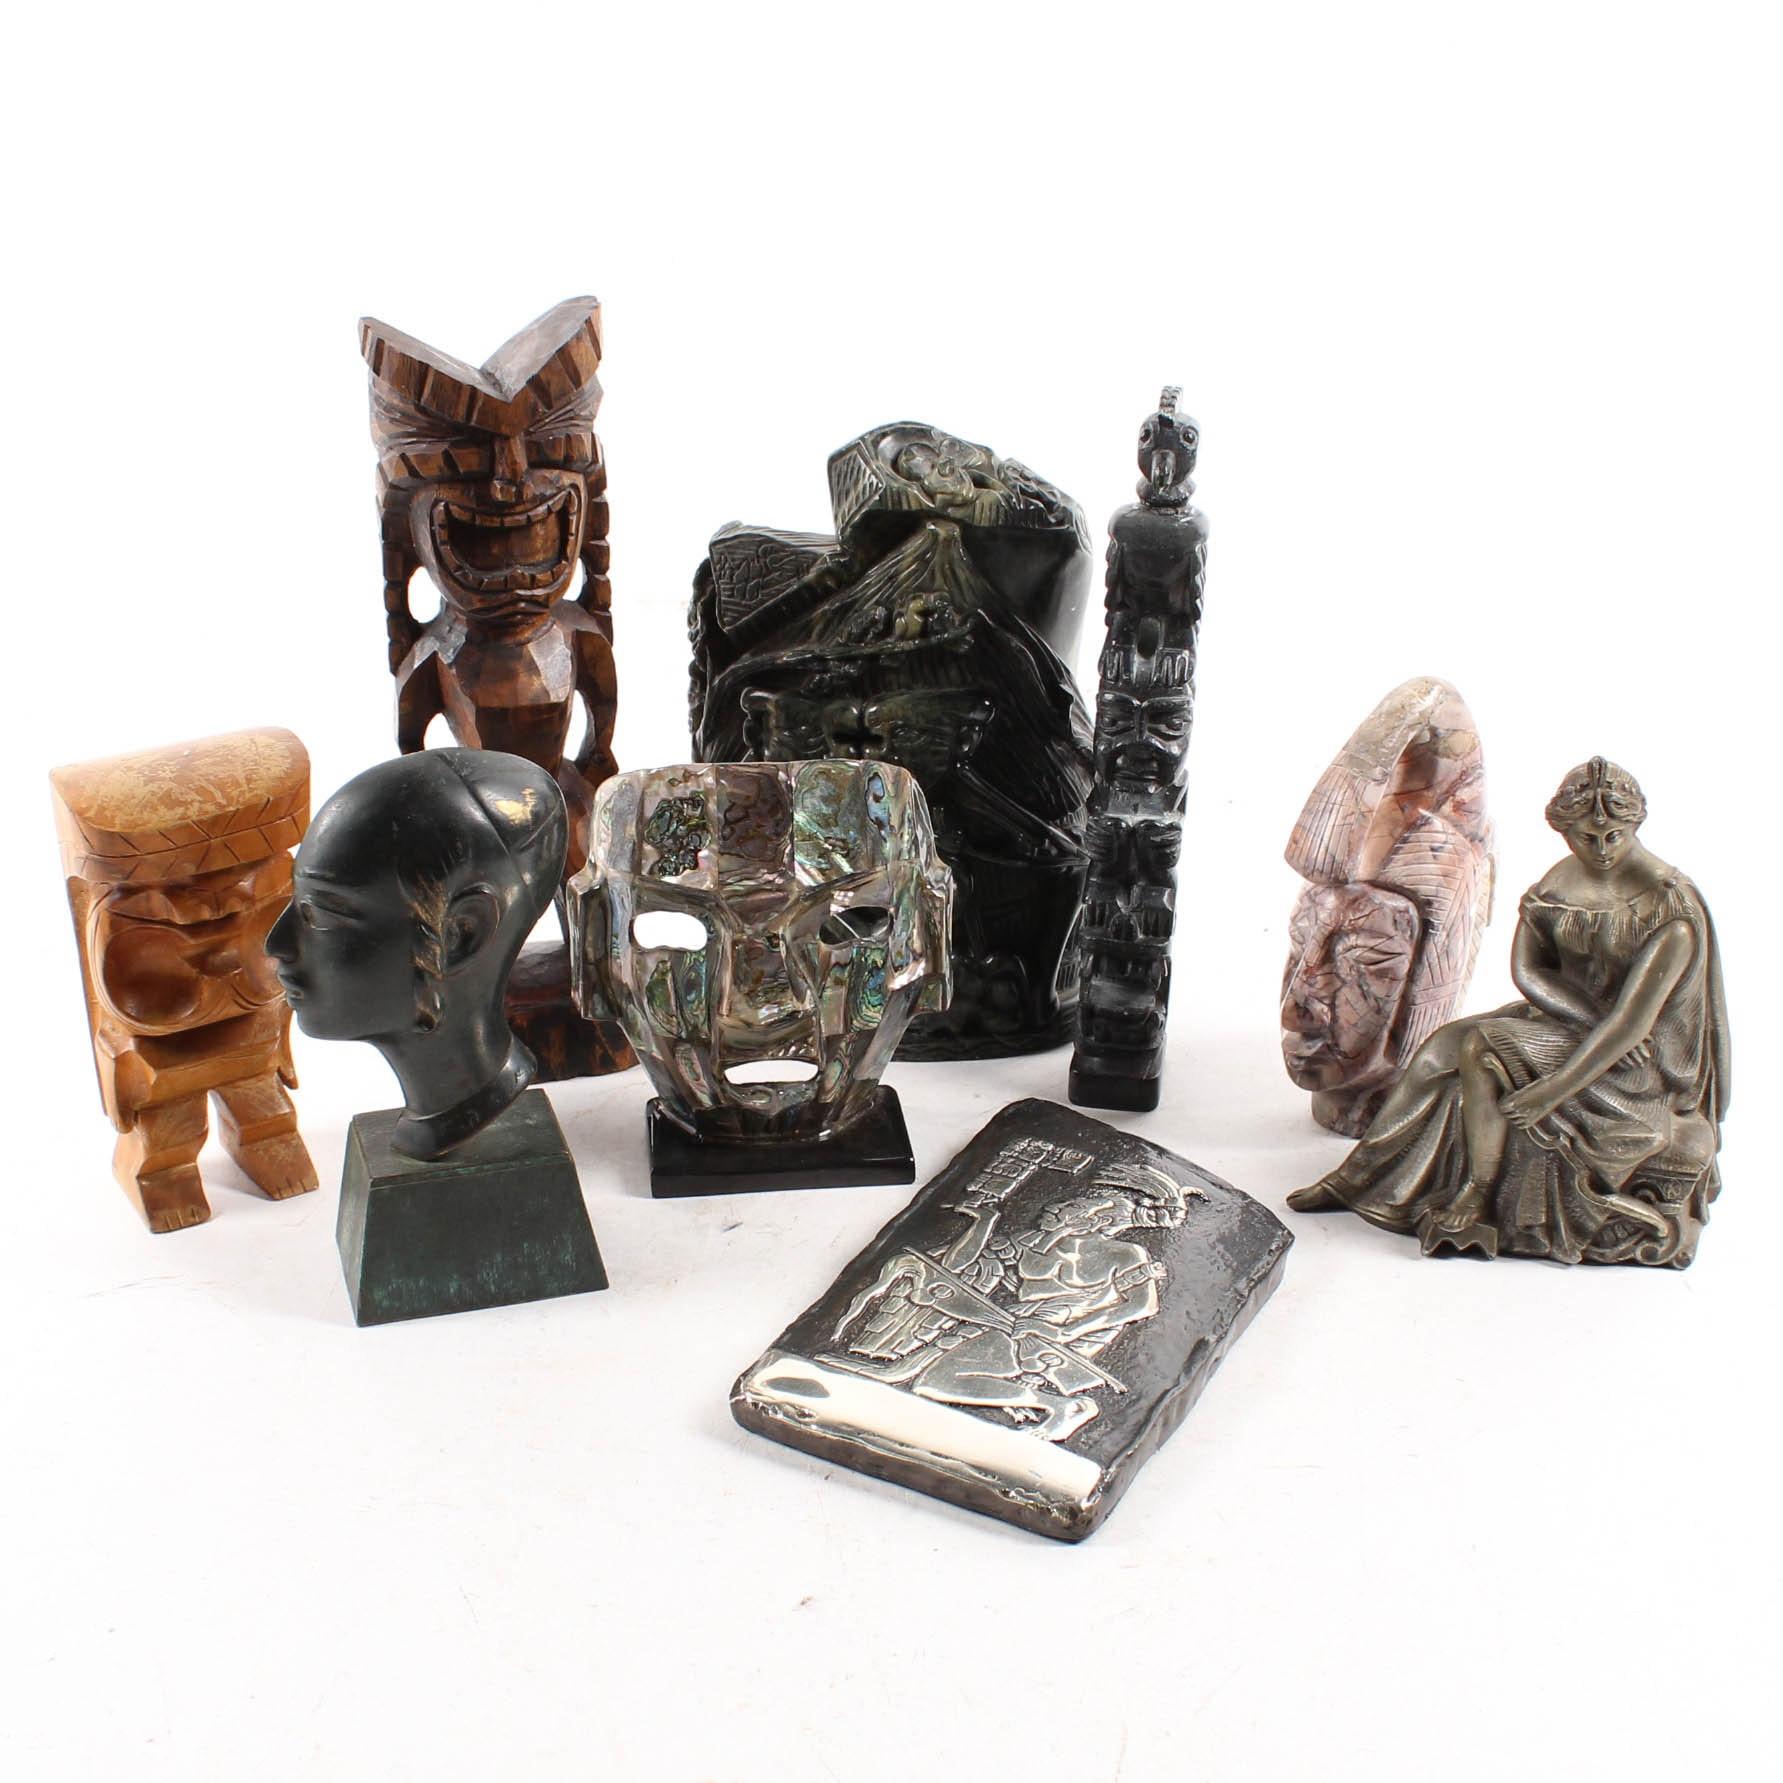 International Sculptures and Figures